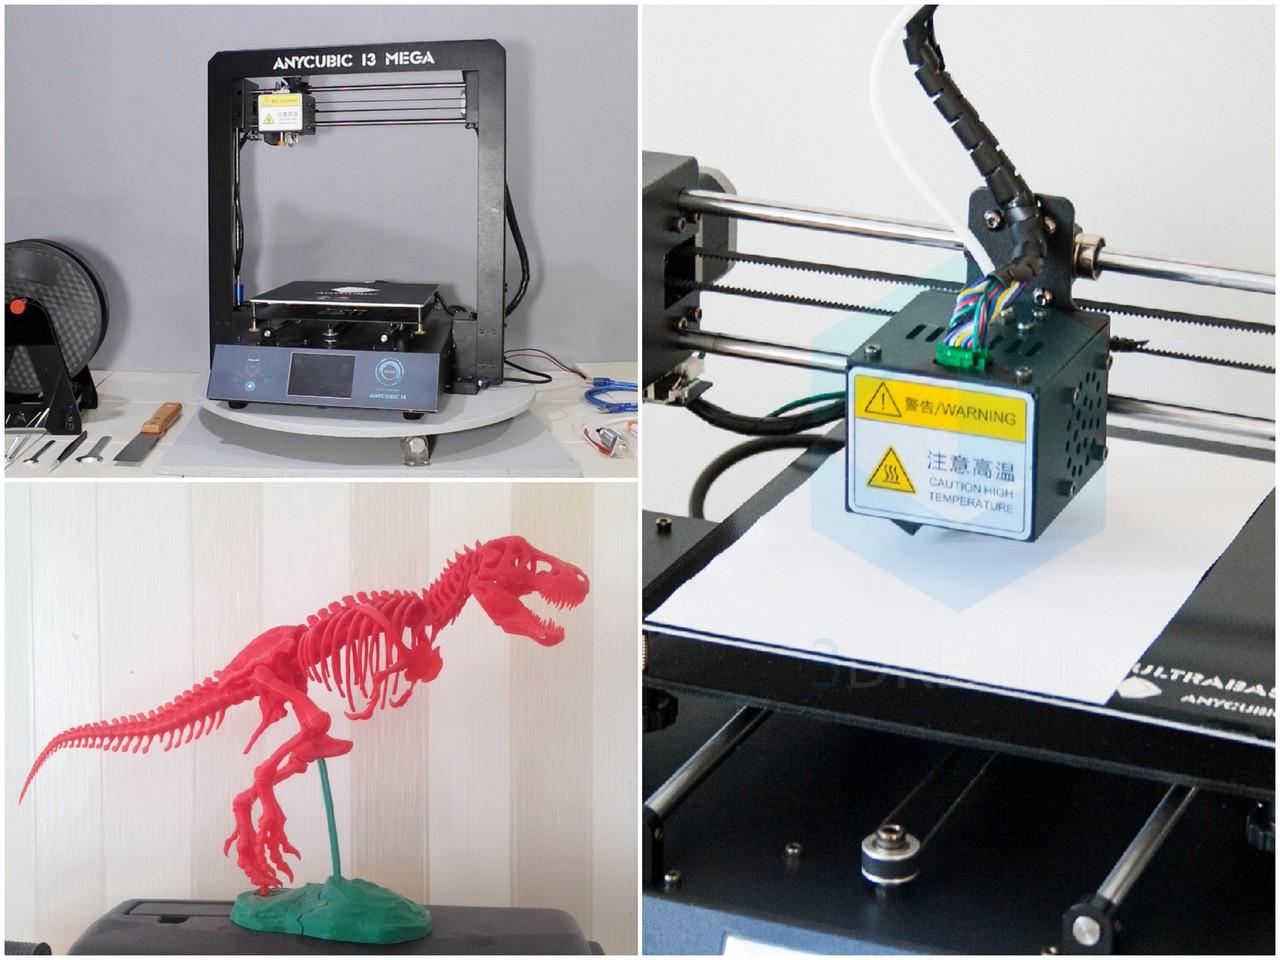 Обзор 3D-принтера Anycubic i3 Mega (ANYCUBIC M)